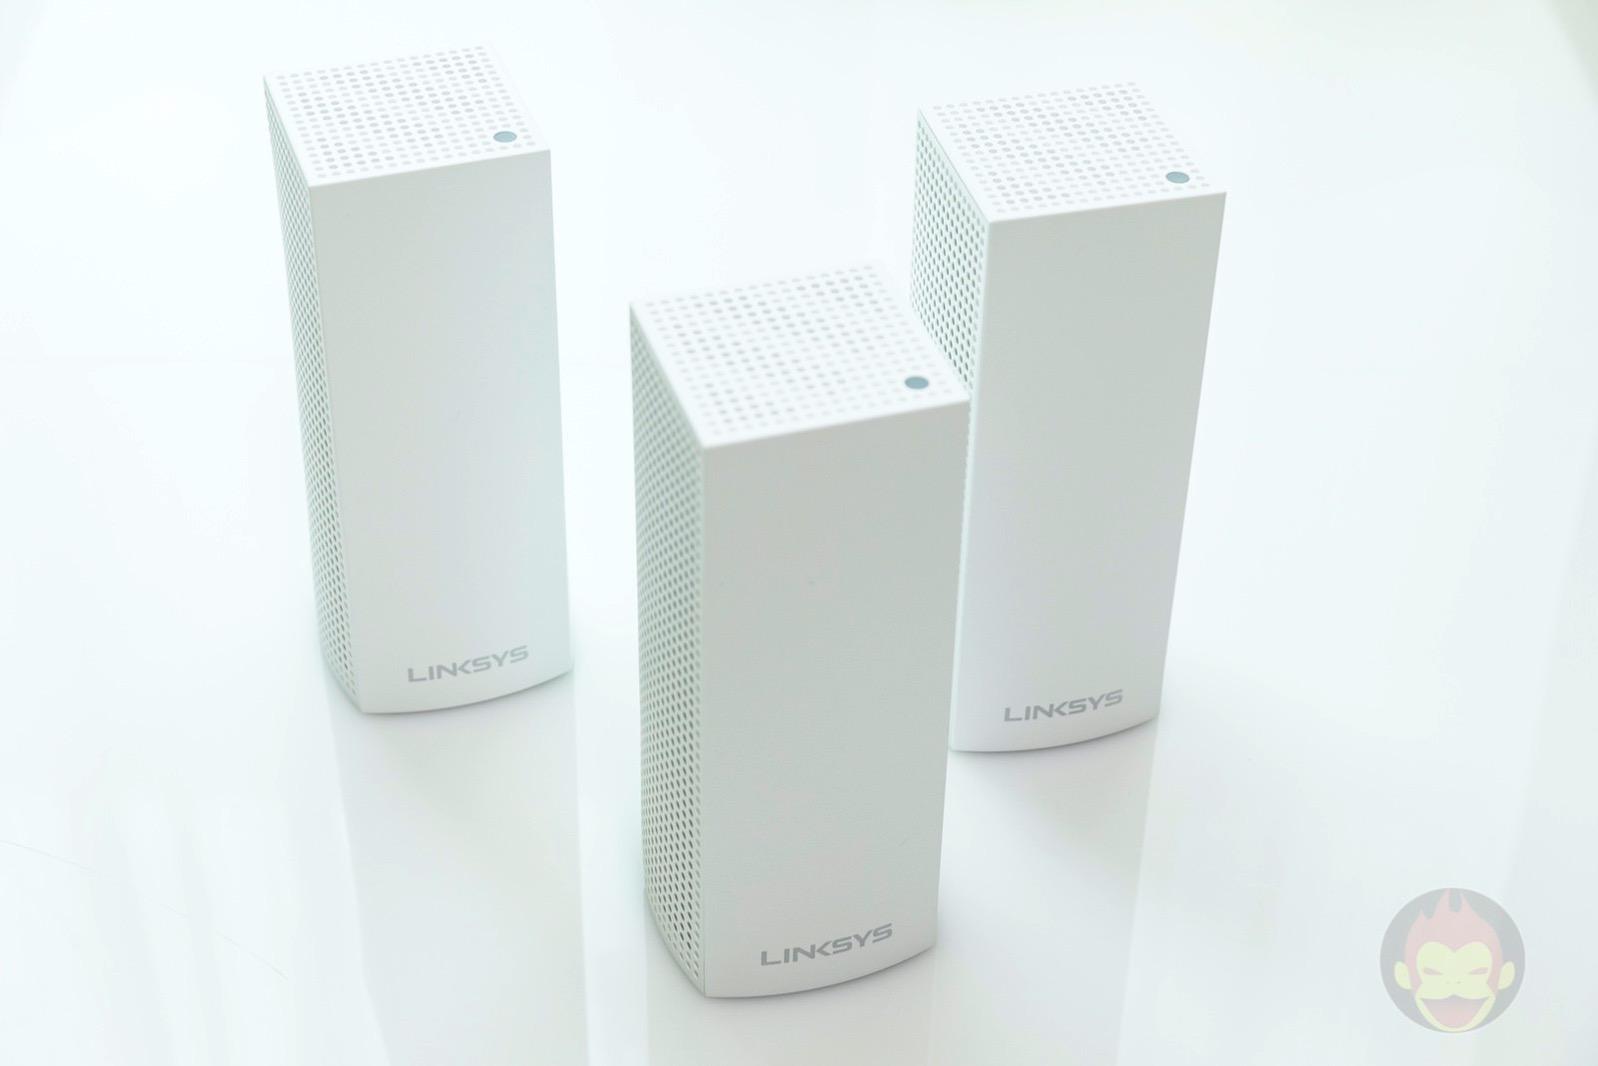 Linksys-Velop-WiFi-Router-01.jpg